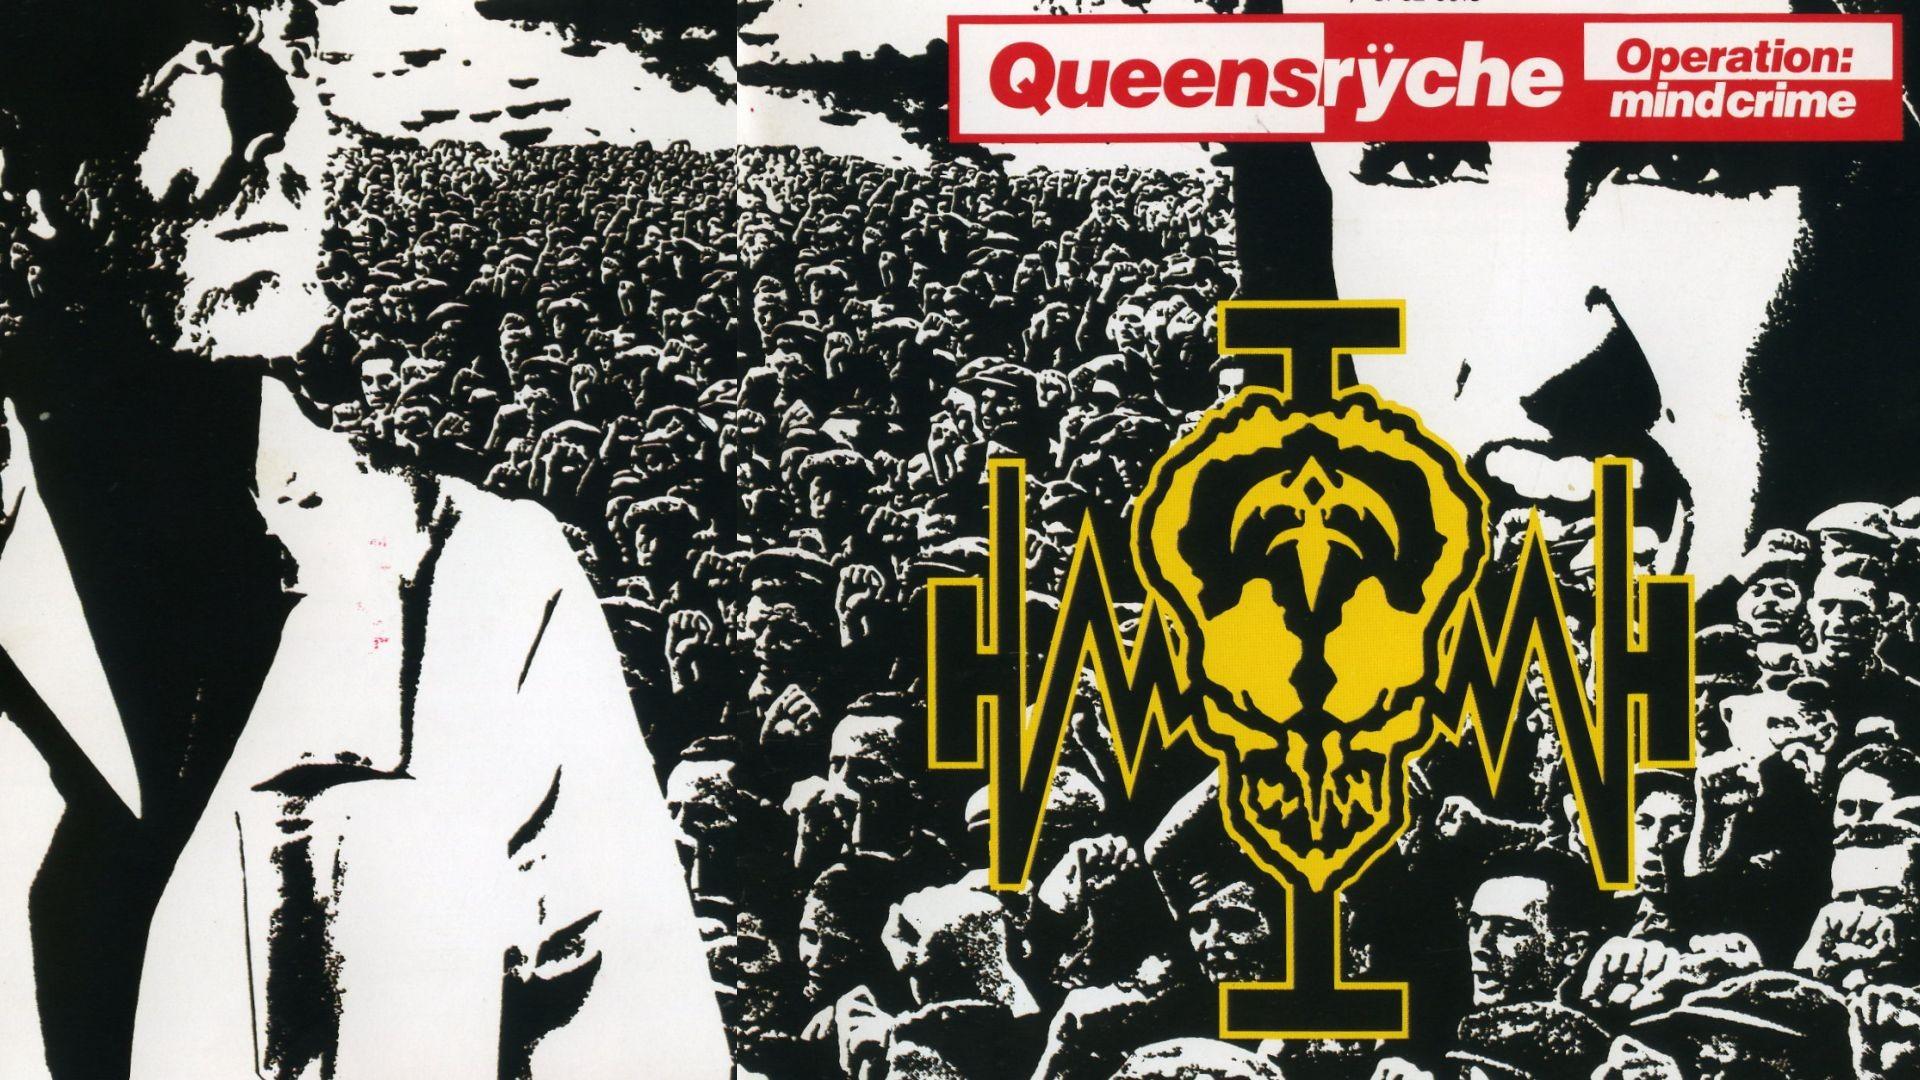 Queensryche Logo Wallpaper Queensryche Ope...